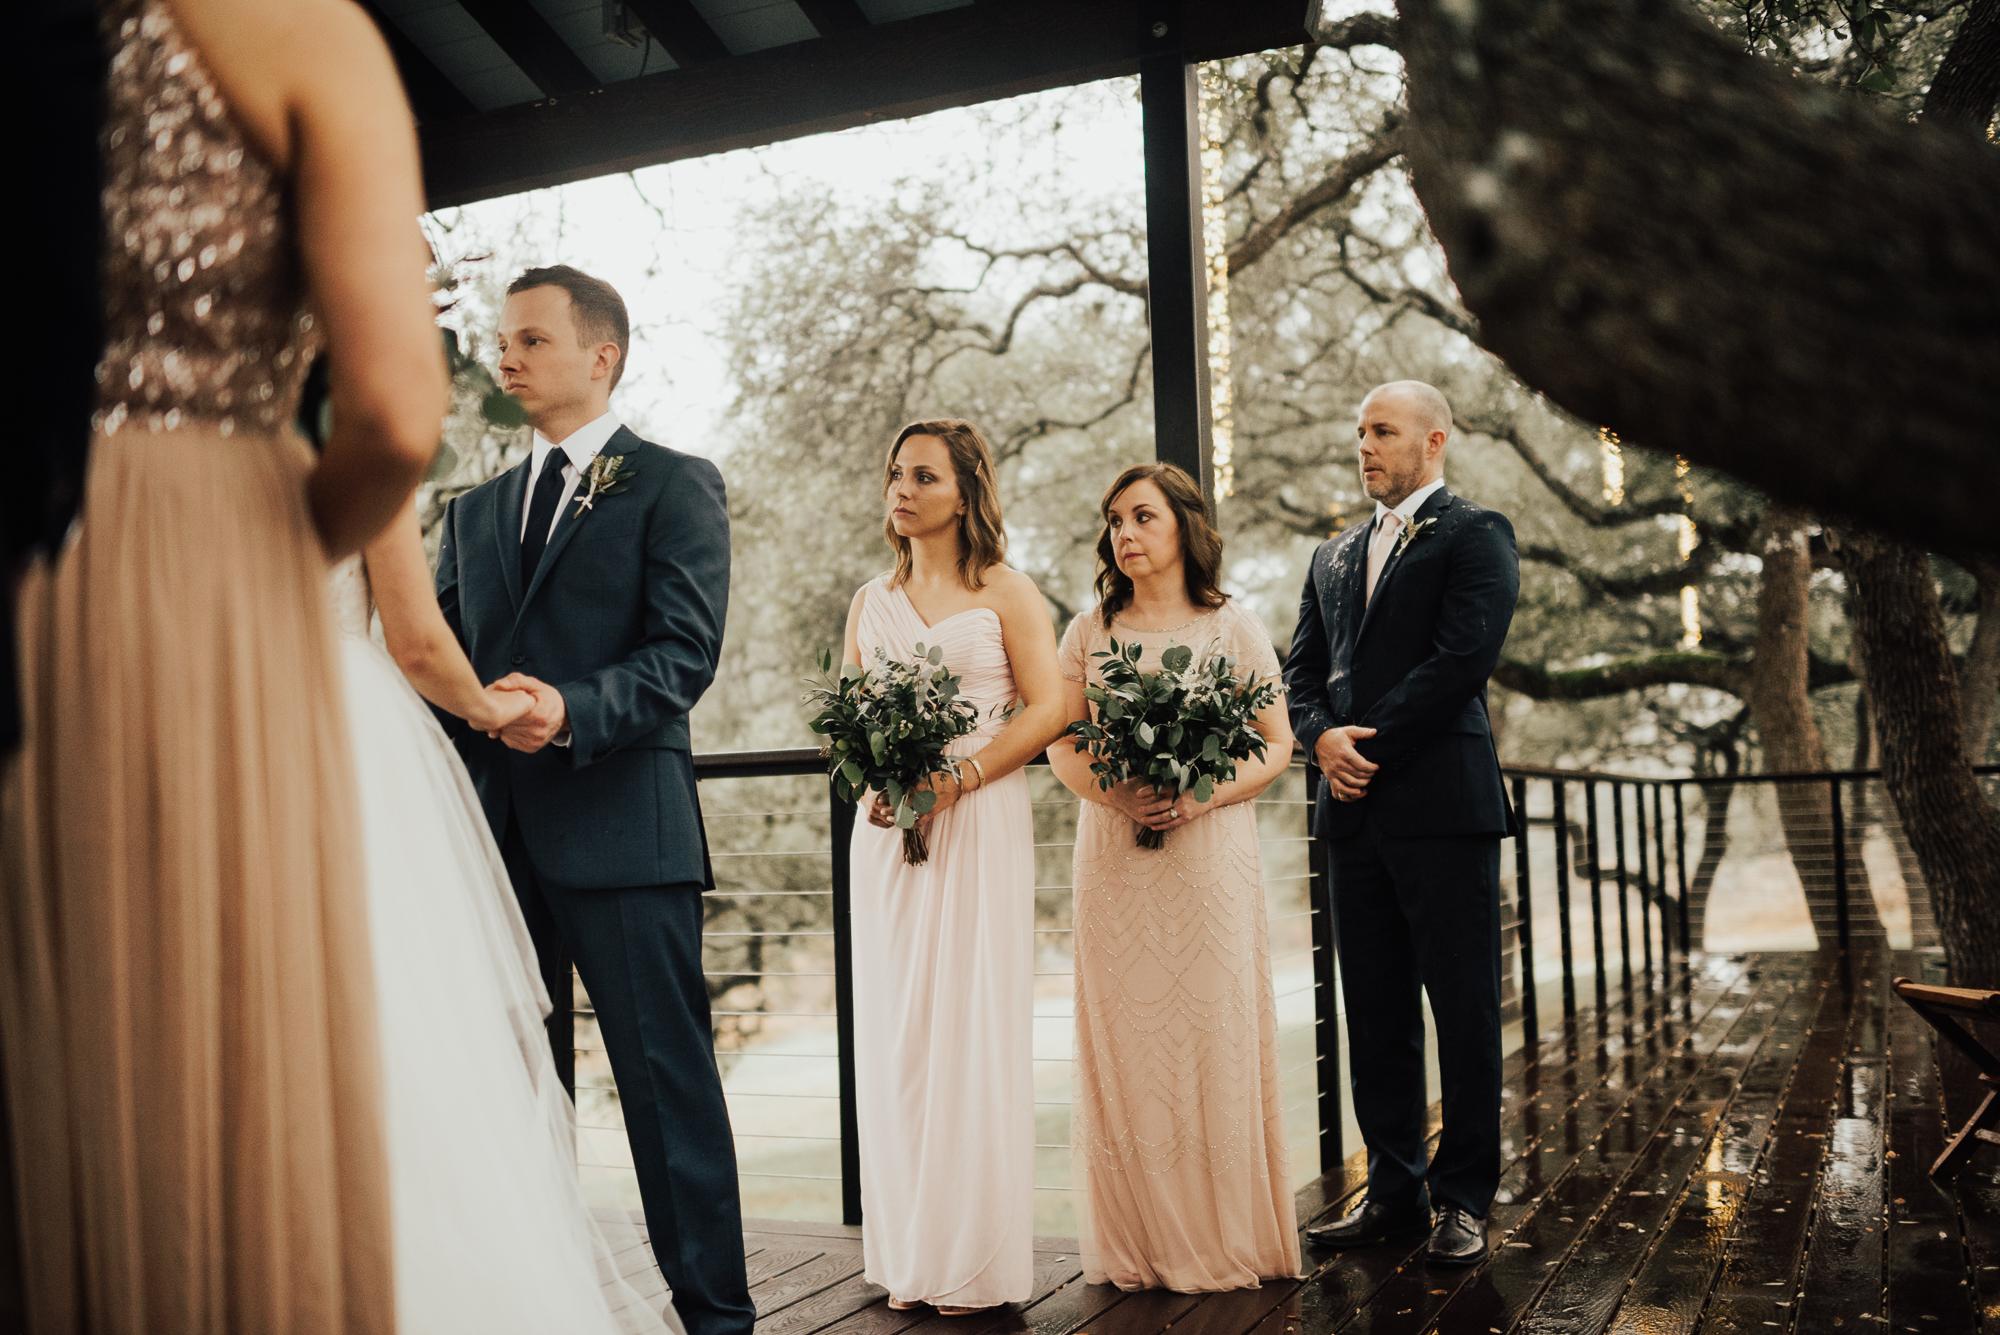 camp-lucy-wedding-232.jpg